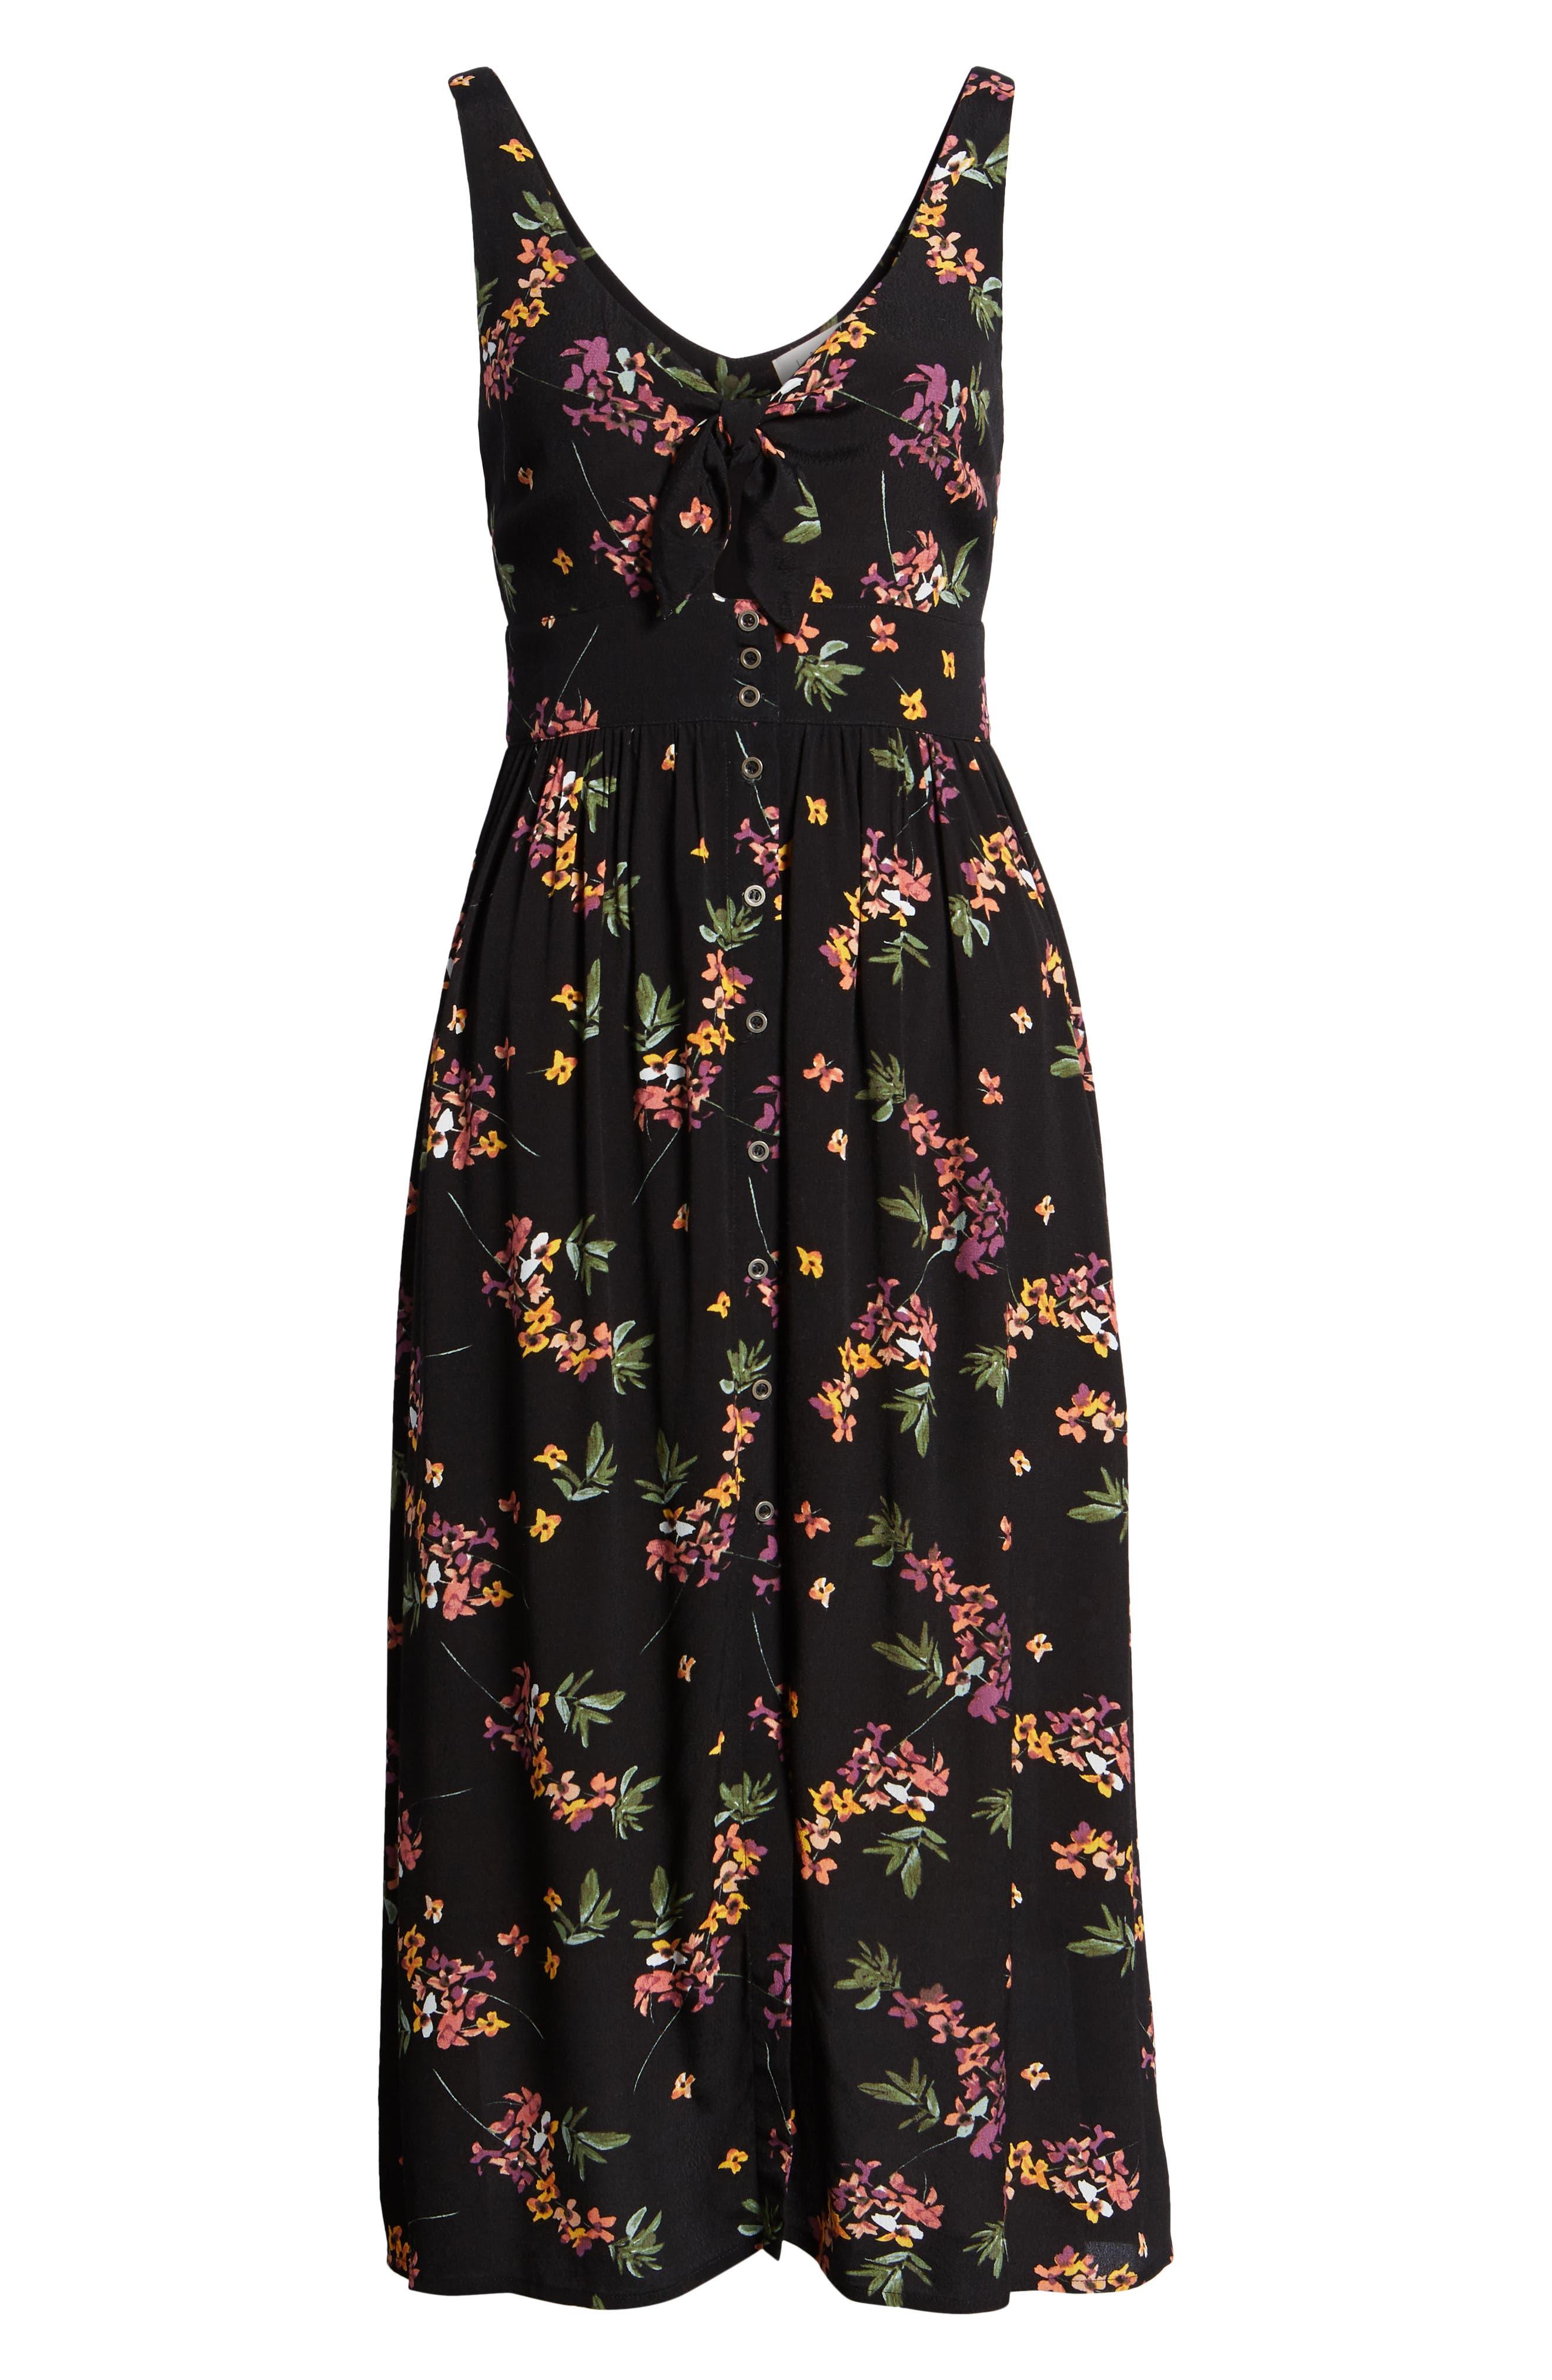 Floral Midi Dress,                             Alternate thumbnail 8, color,                             Black Floral